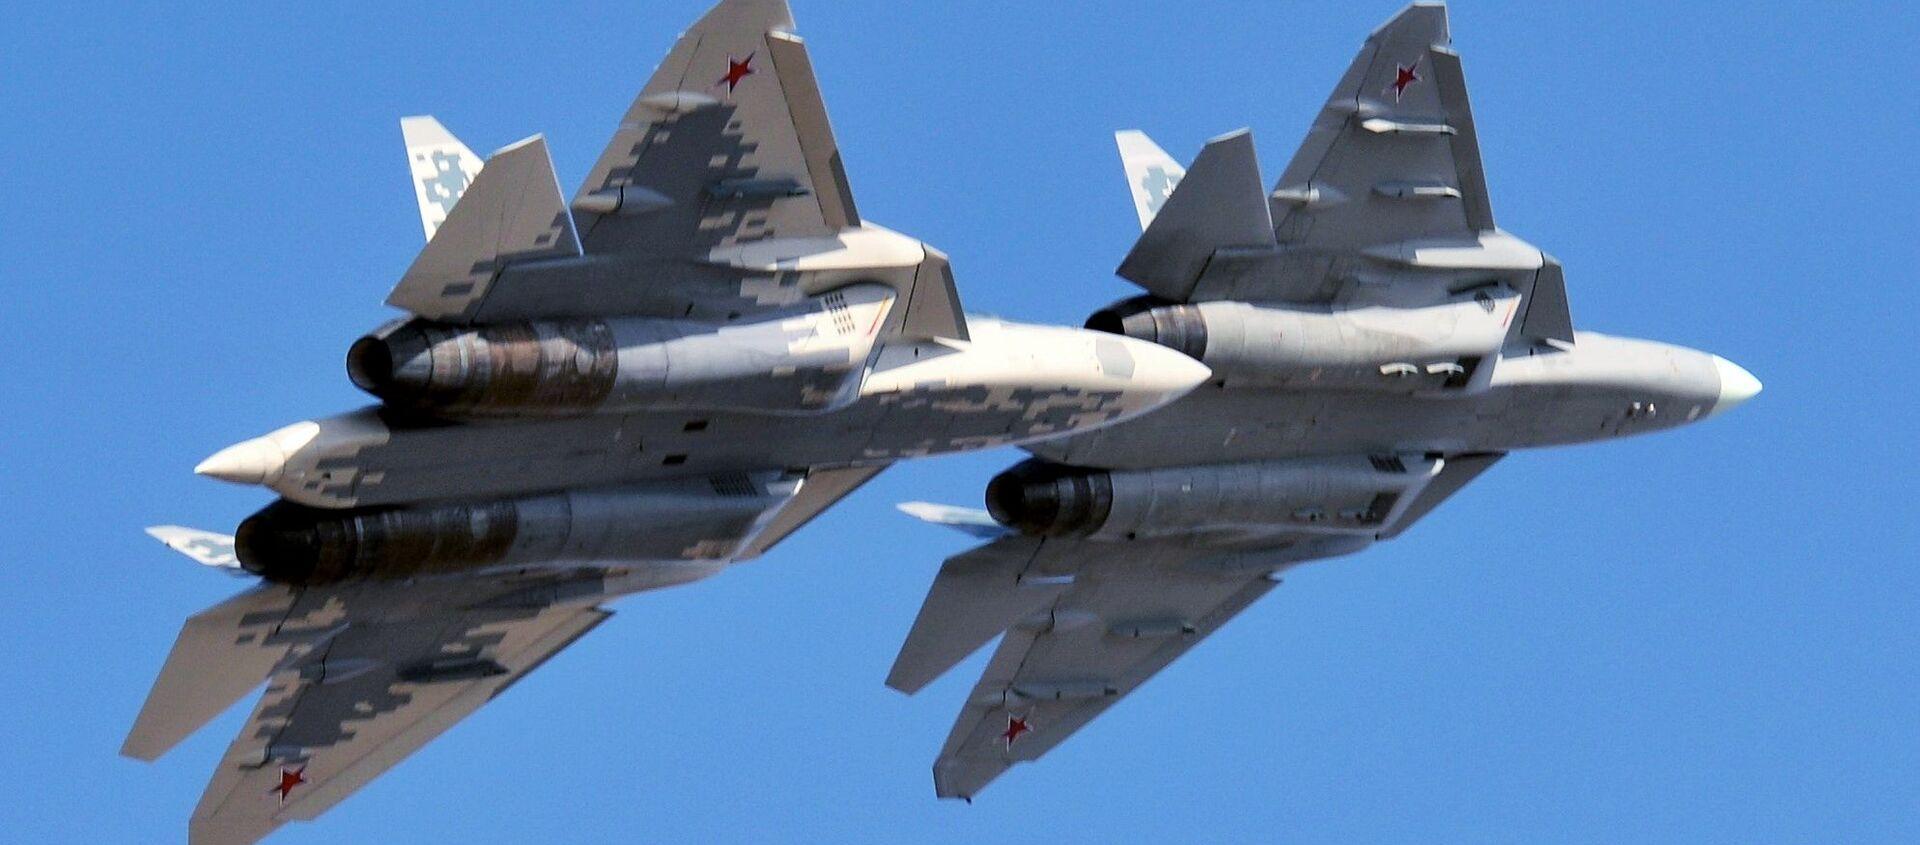 Cazas Su-57 rusos - Sputnik Mundo, 1920, 20.01.2021